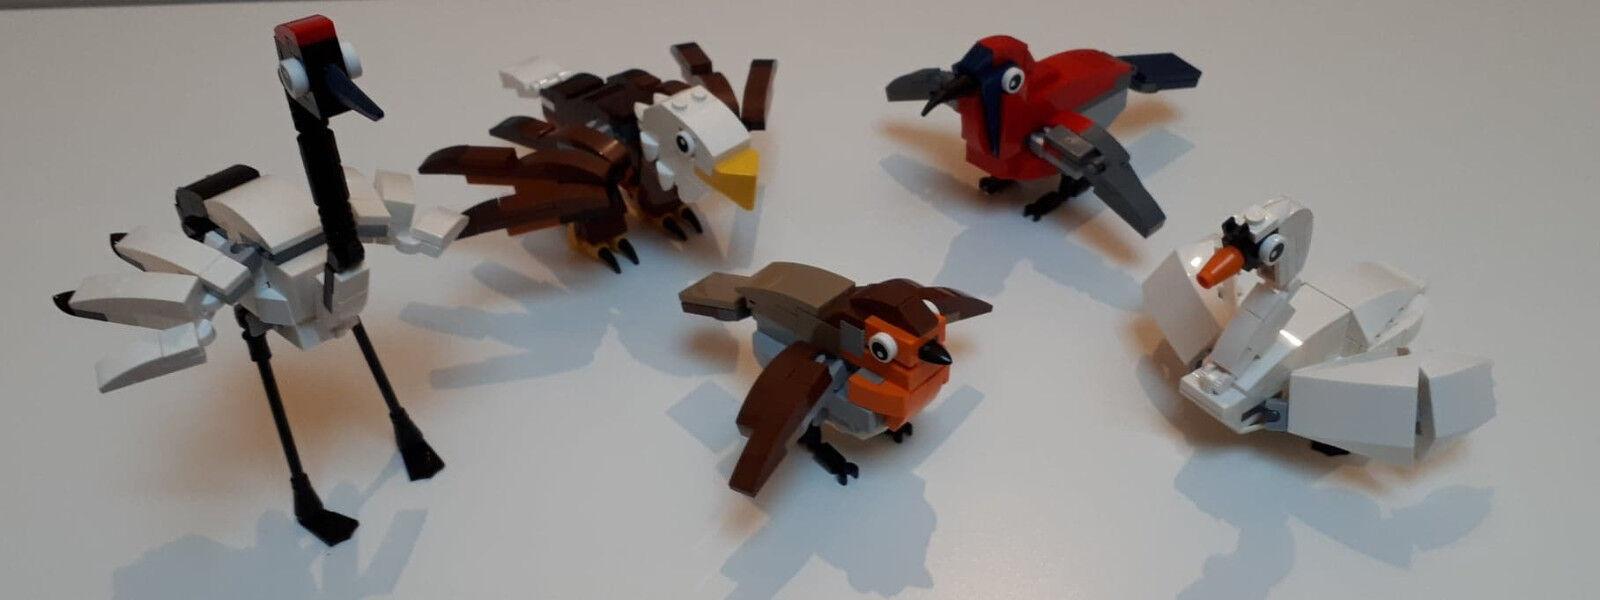 Lego 4002014 Hub birds Exclusive Employee Set - Oiseaux set exclusif employé